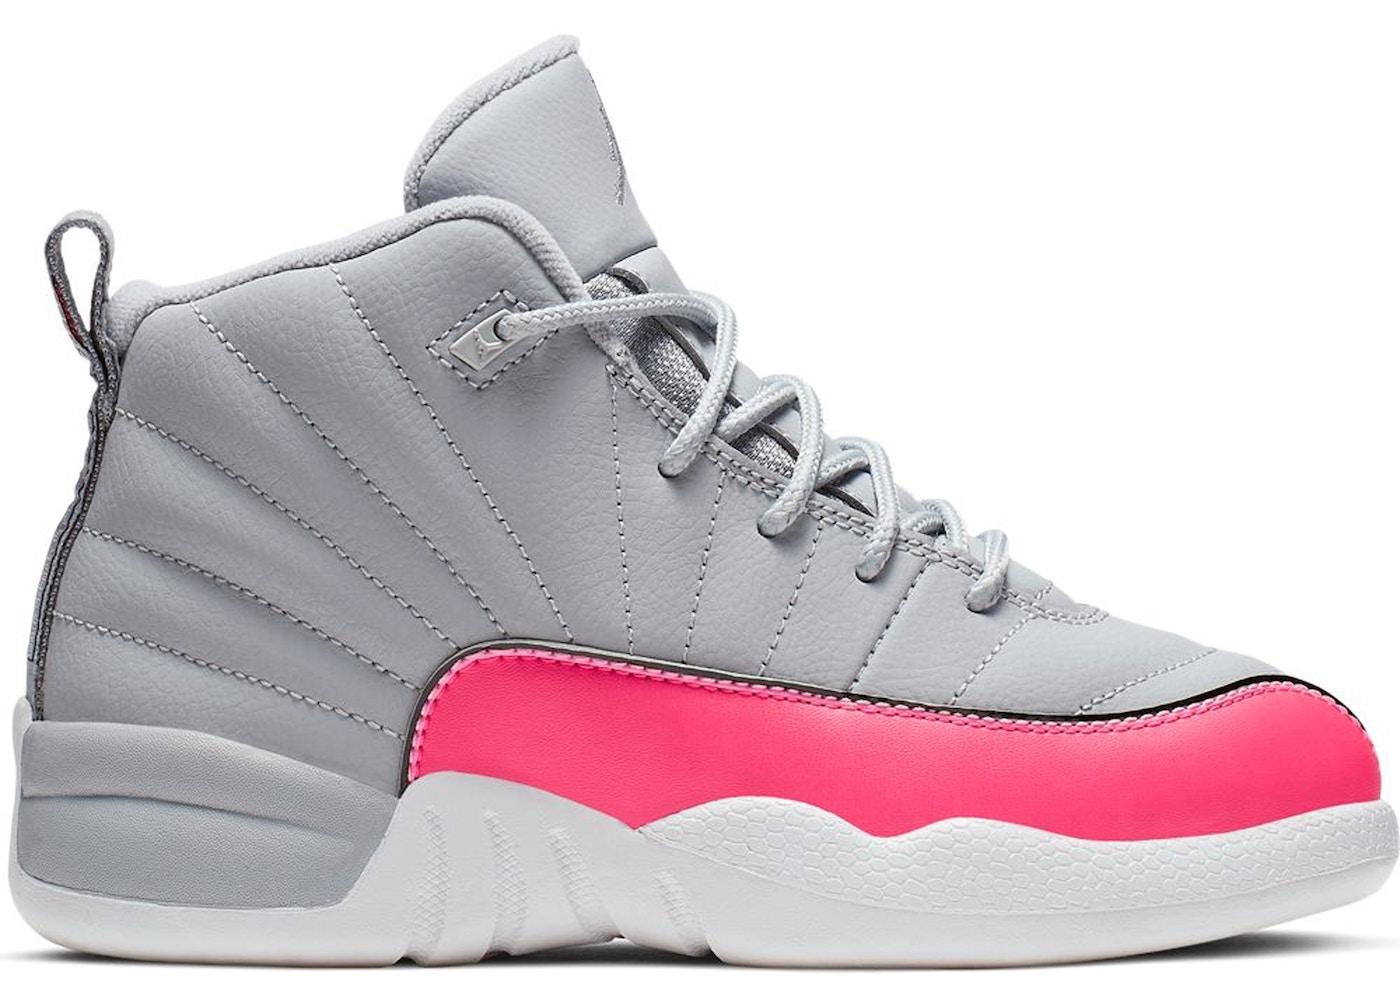 los angeles 45a41 28997 Jordan 12 Retro Wolf Grey Racer Pink (PS)